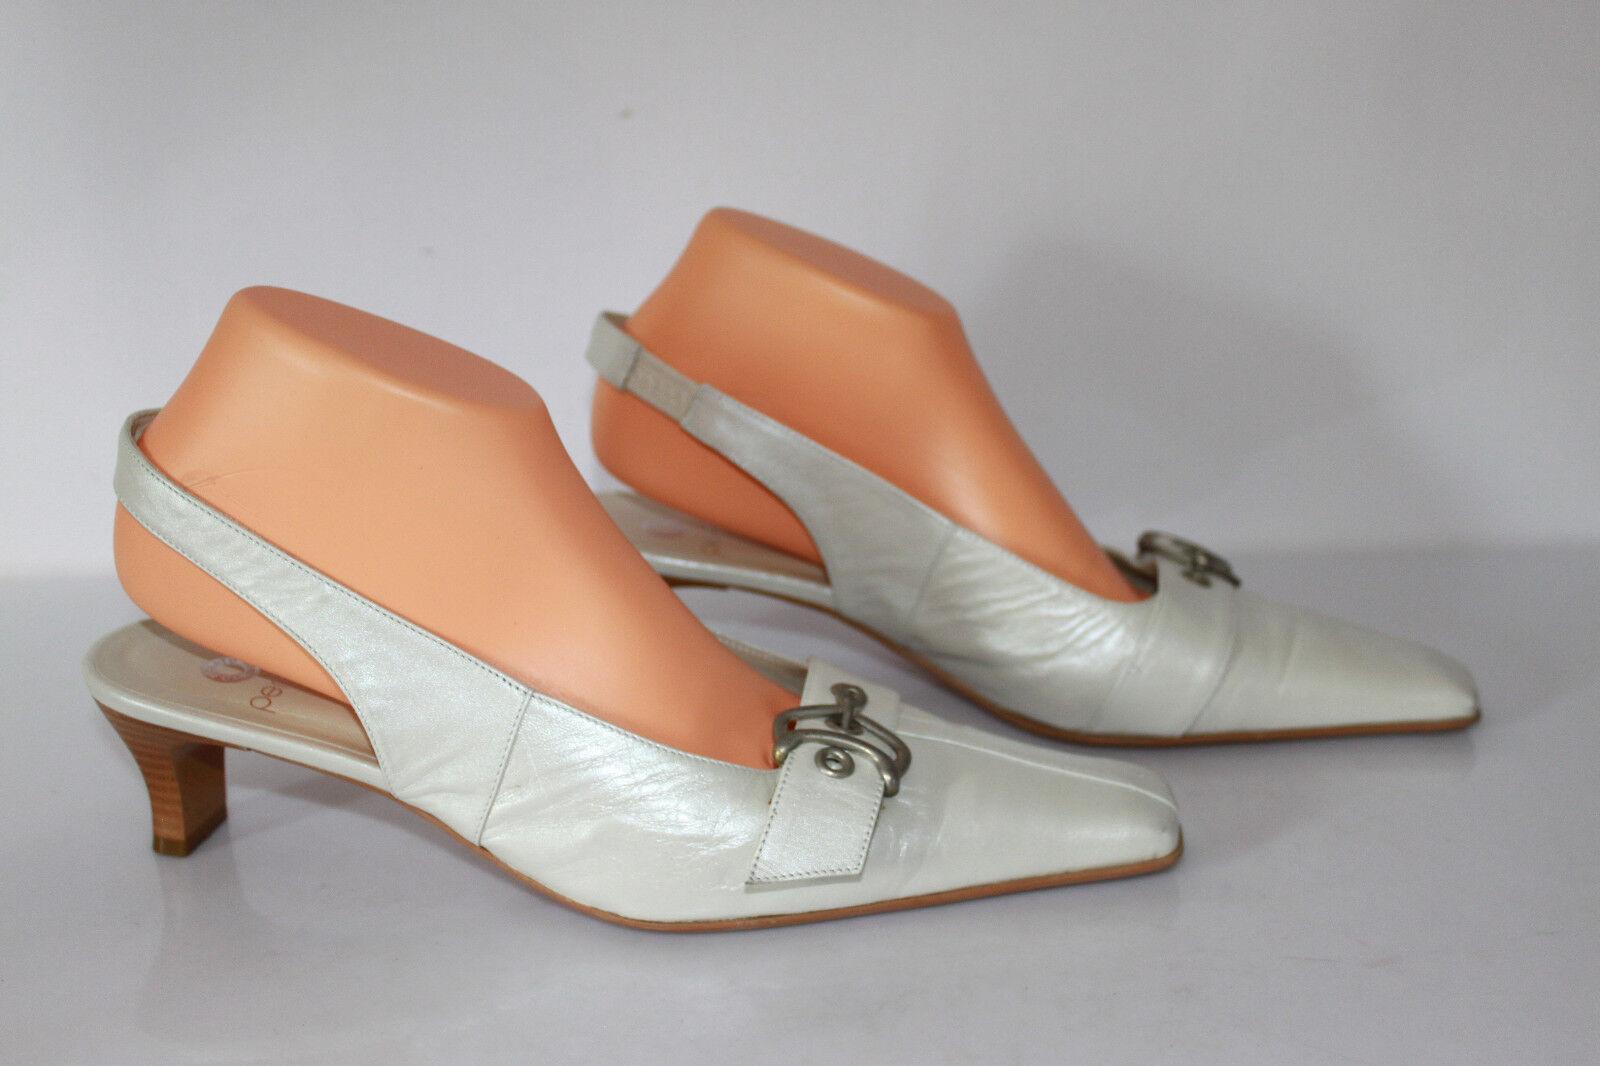 Open Court shoes PERLATO Leather Ecru slightly Iridescent T 41